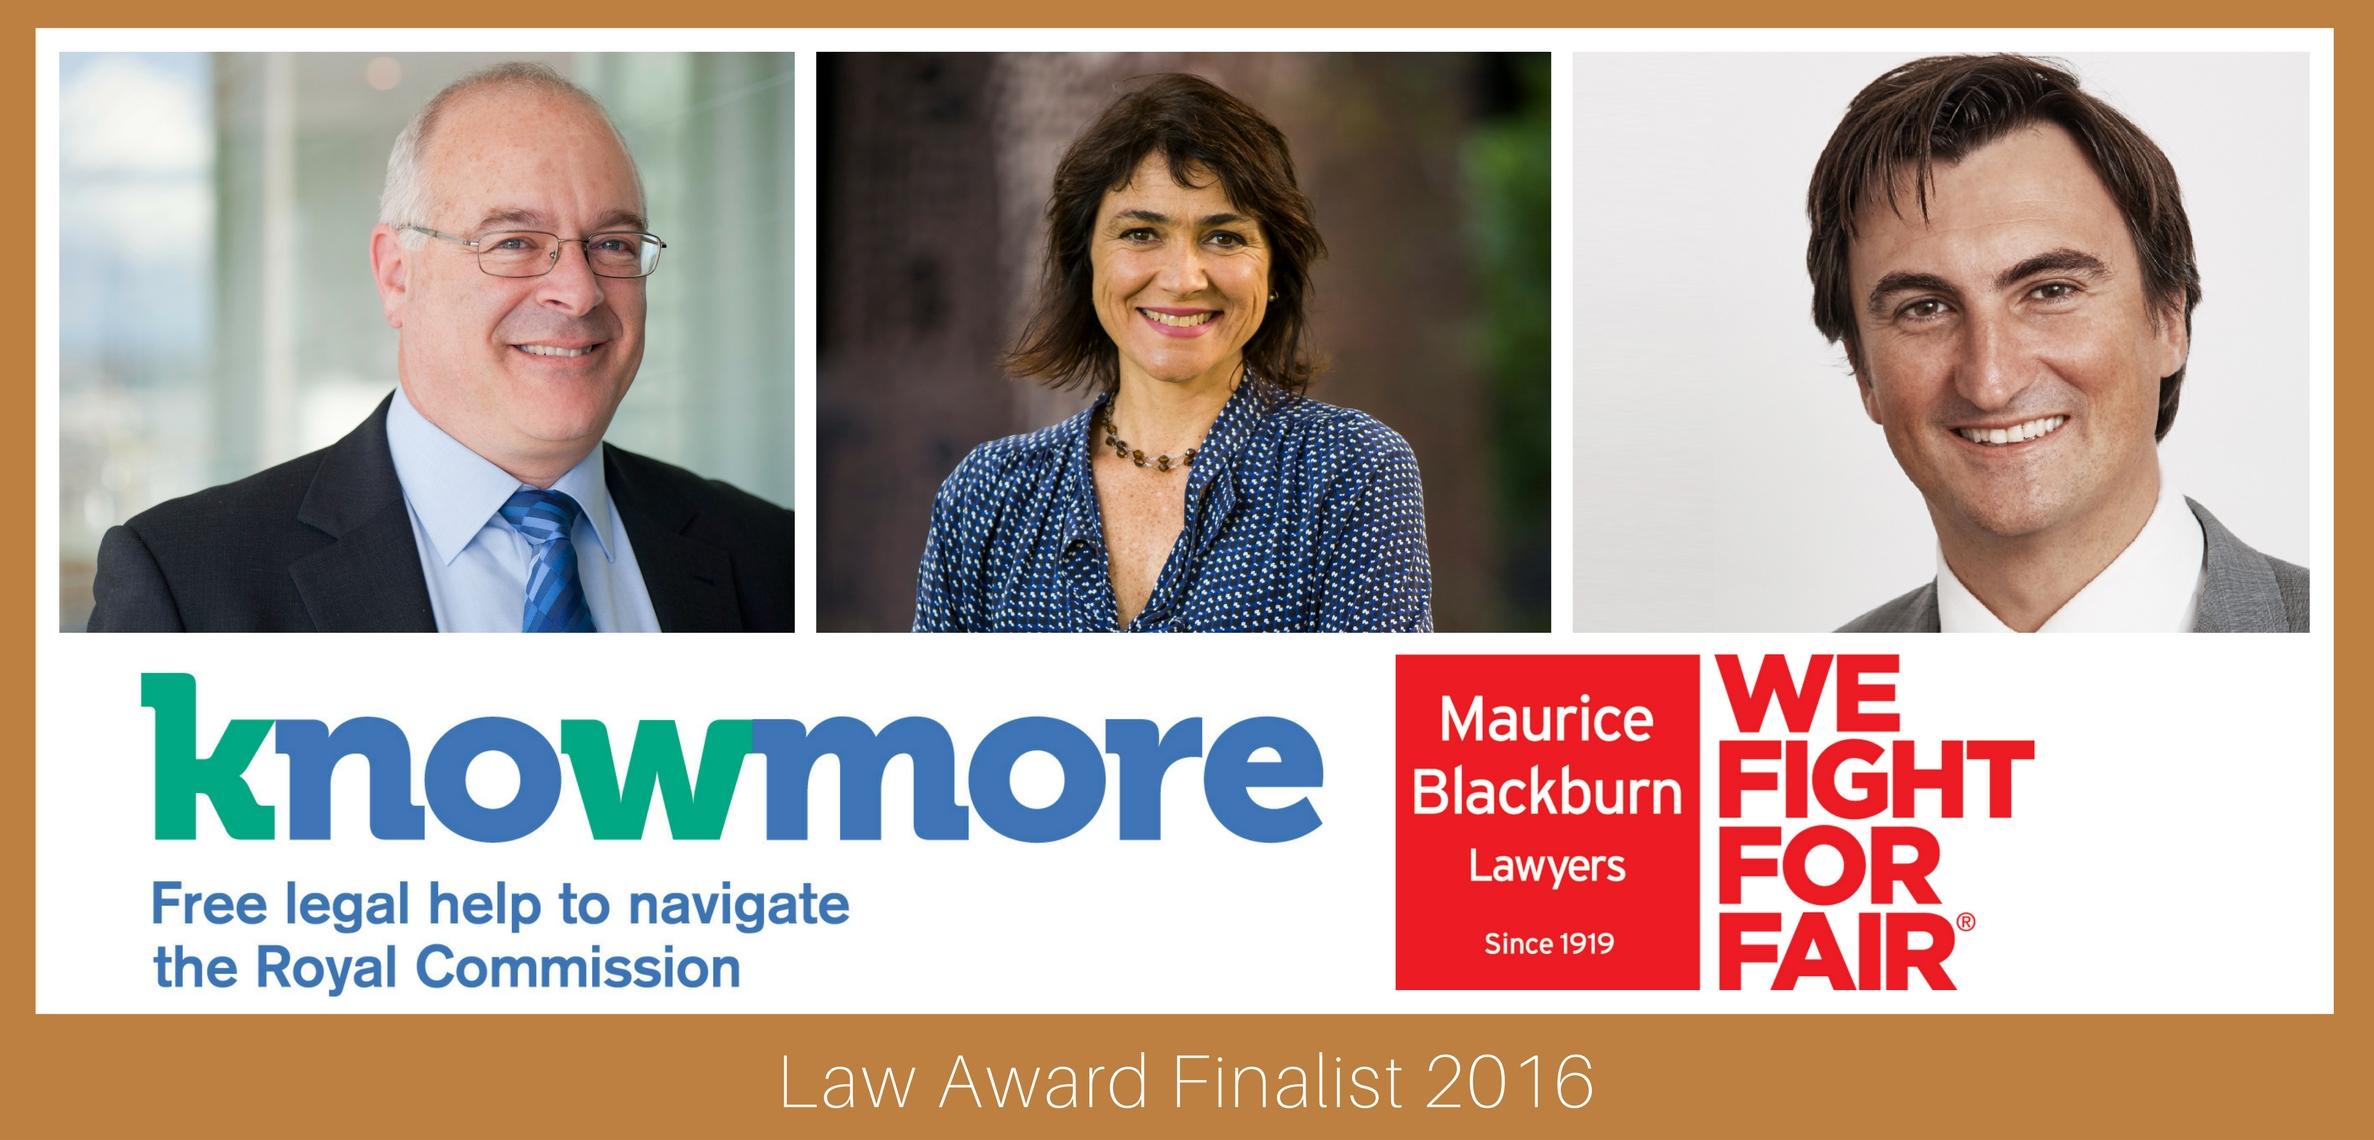 Law Award finalists 2016